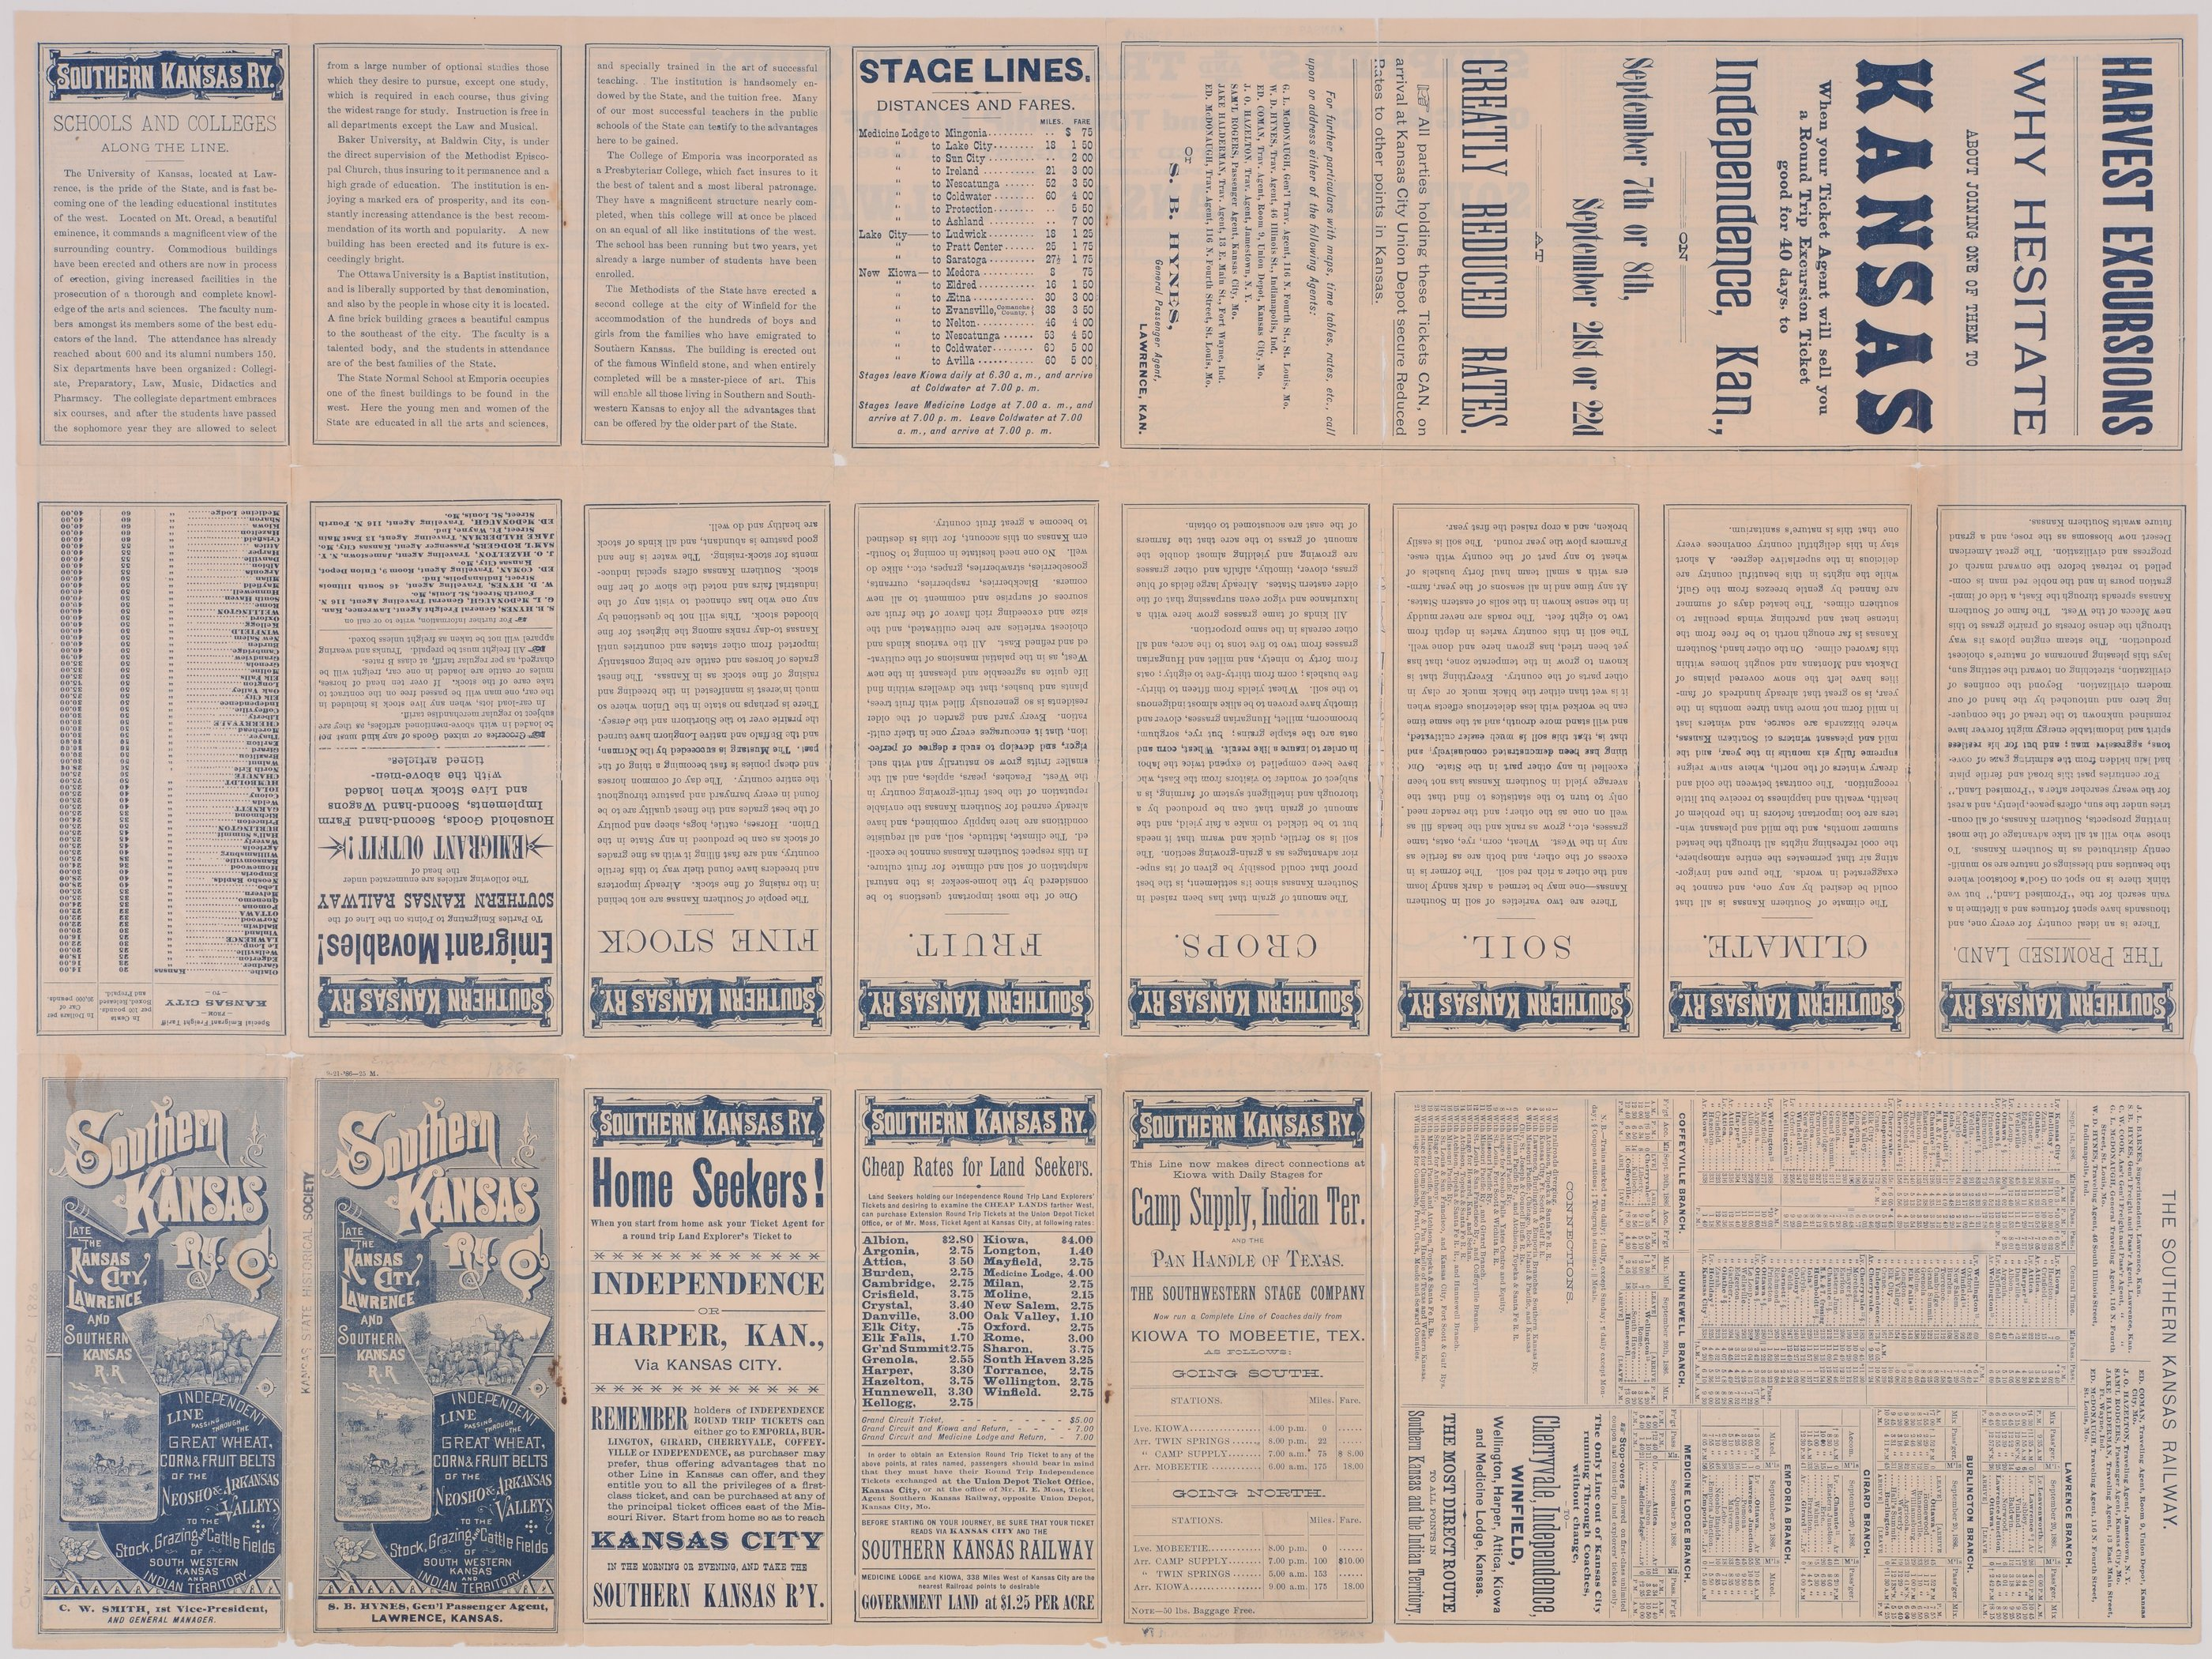 Southern Kansas Railway Company - 1